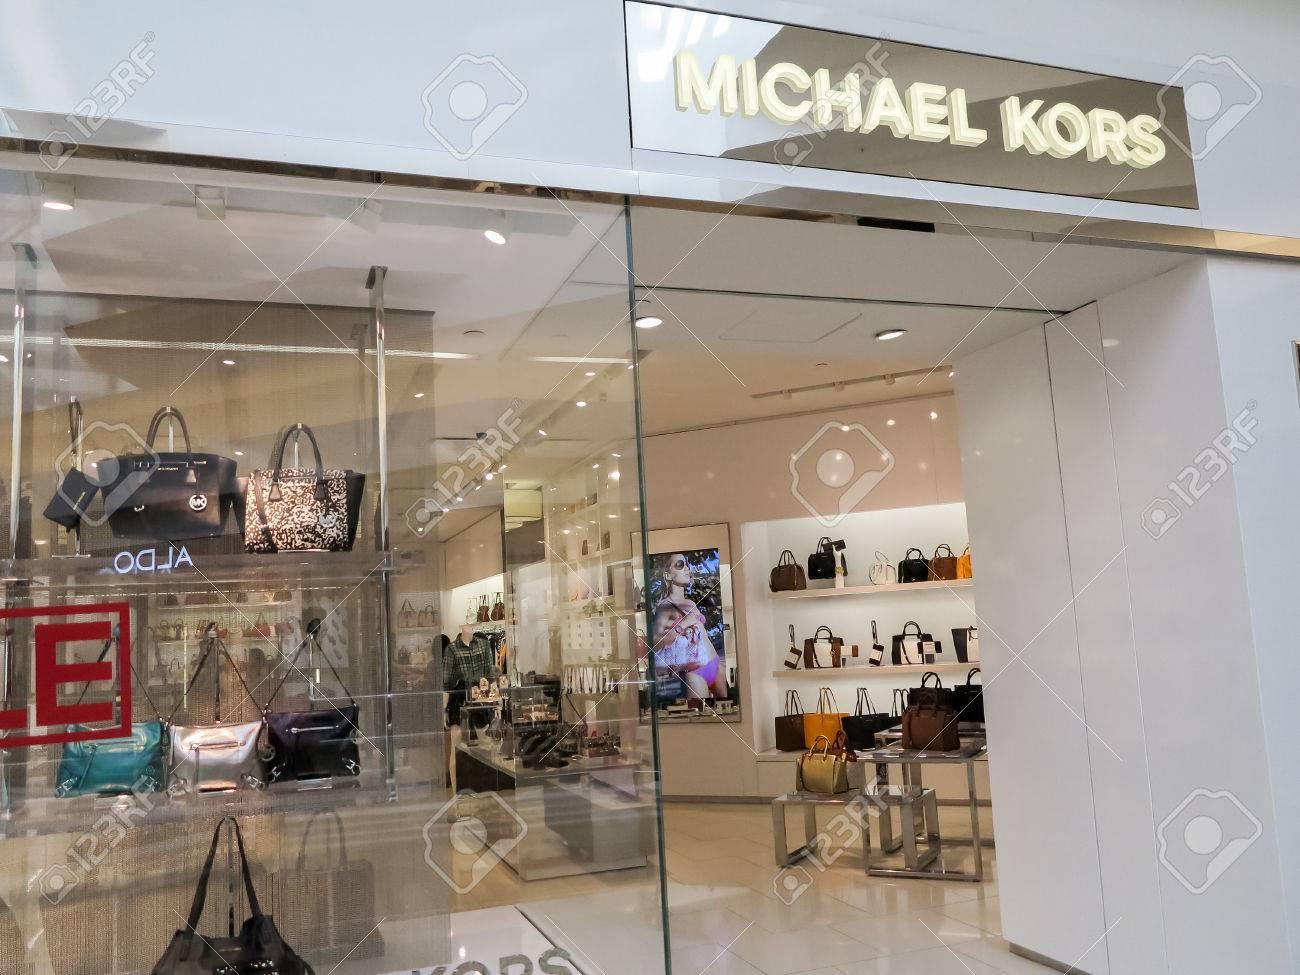 fashion designer michael kors 6nqw  DENVER, USA